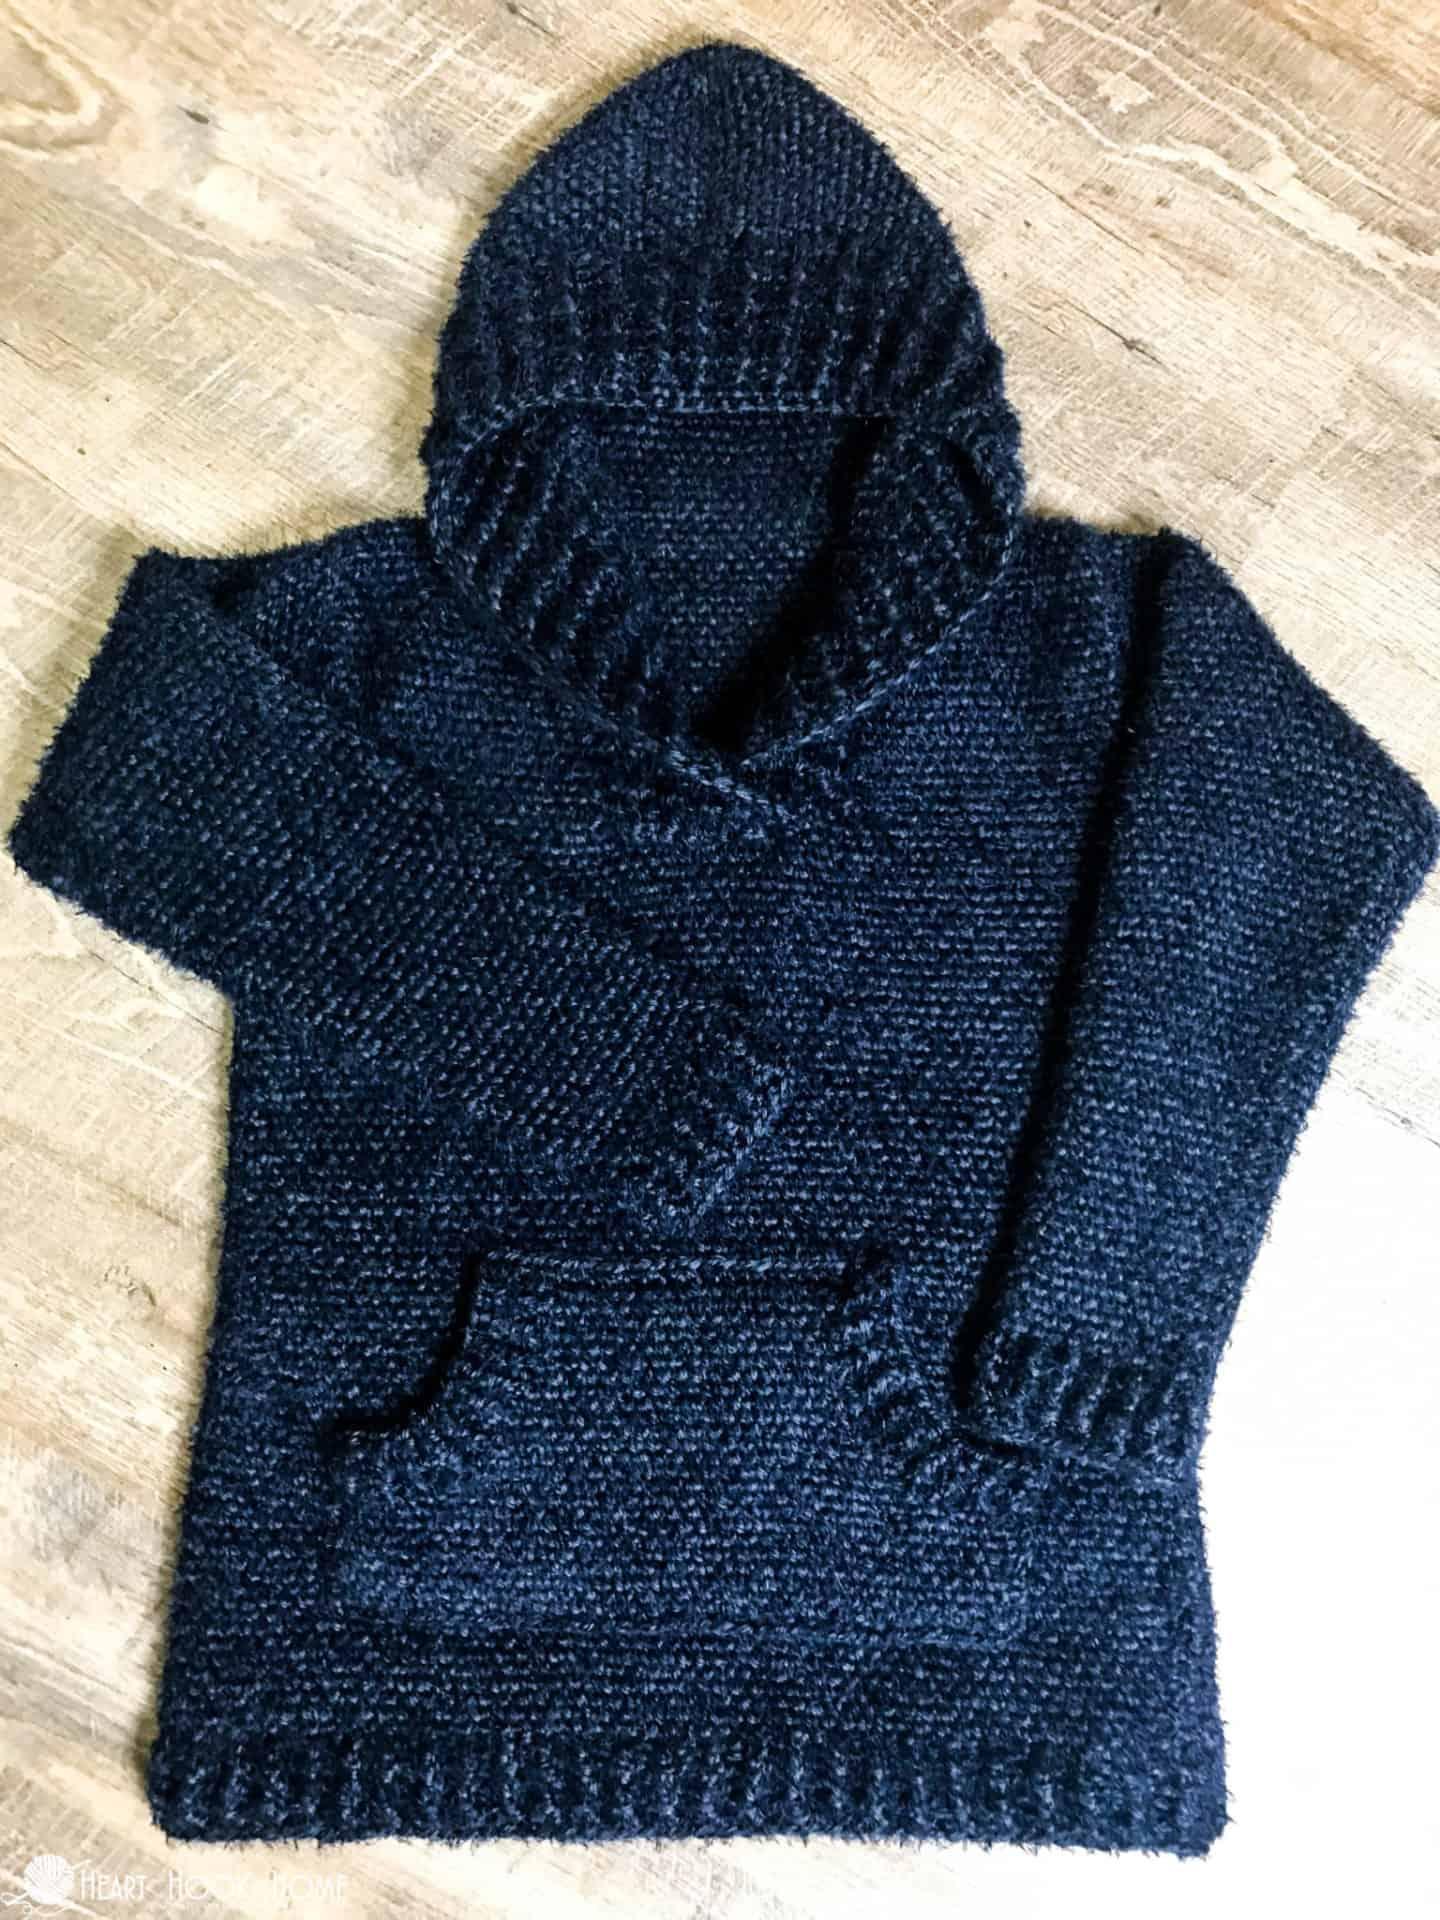 Hibernation Hoodie Crochet Pattern S 3xl